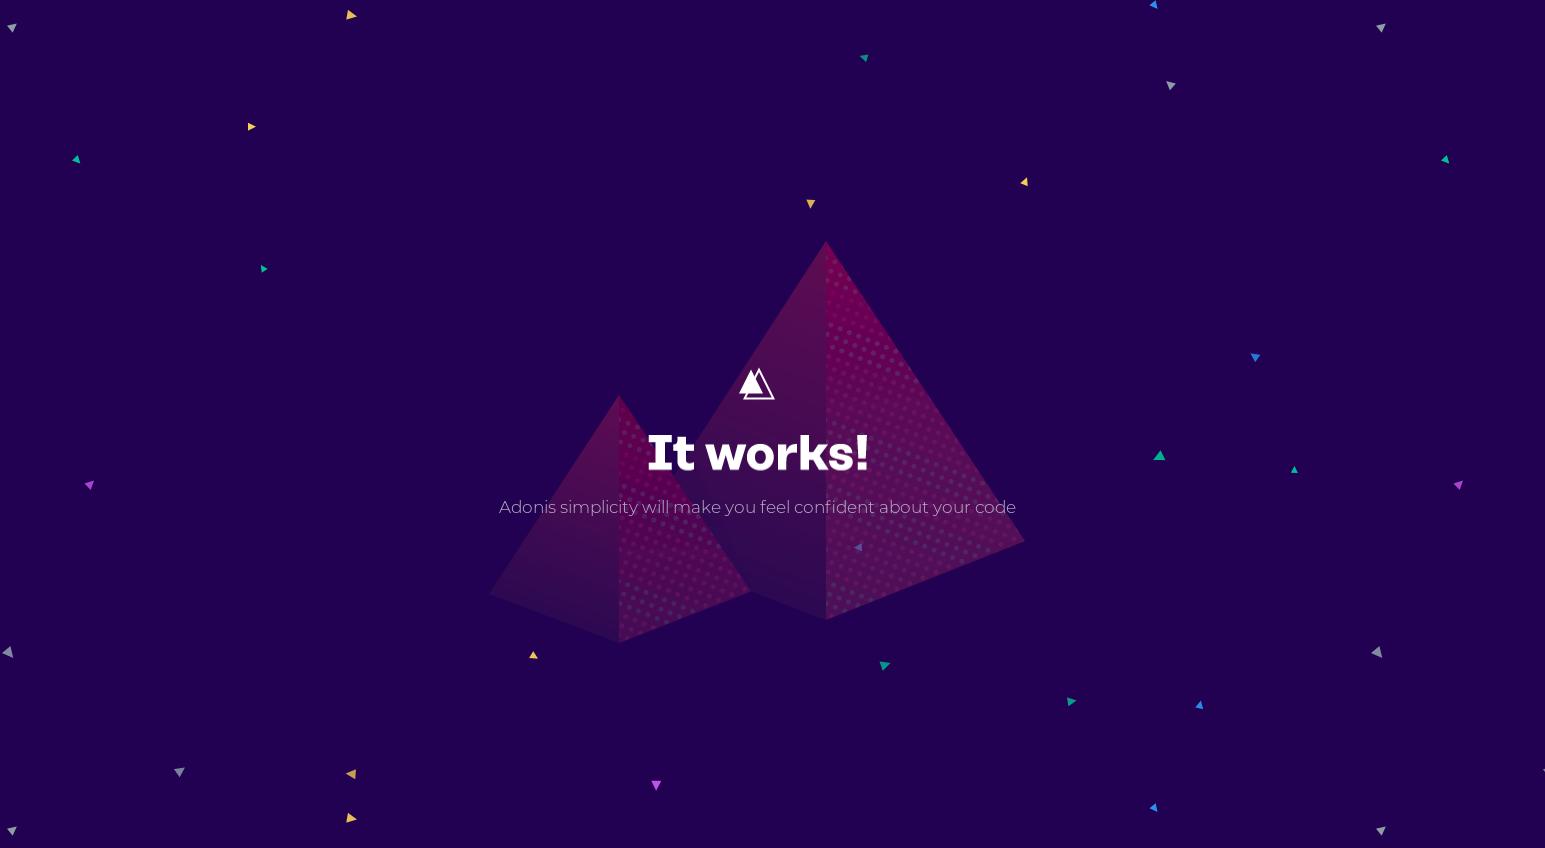 Dockerizing an AdonisJs App